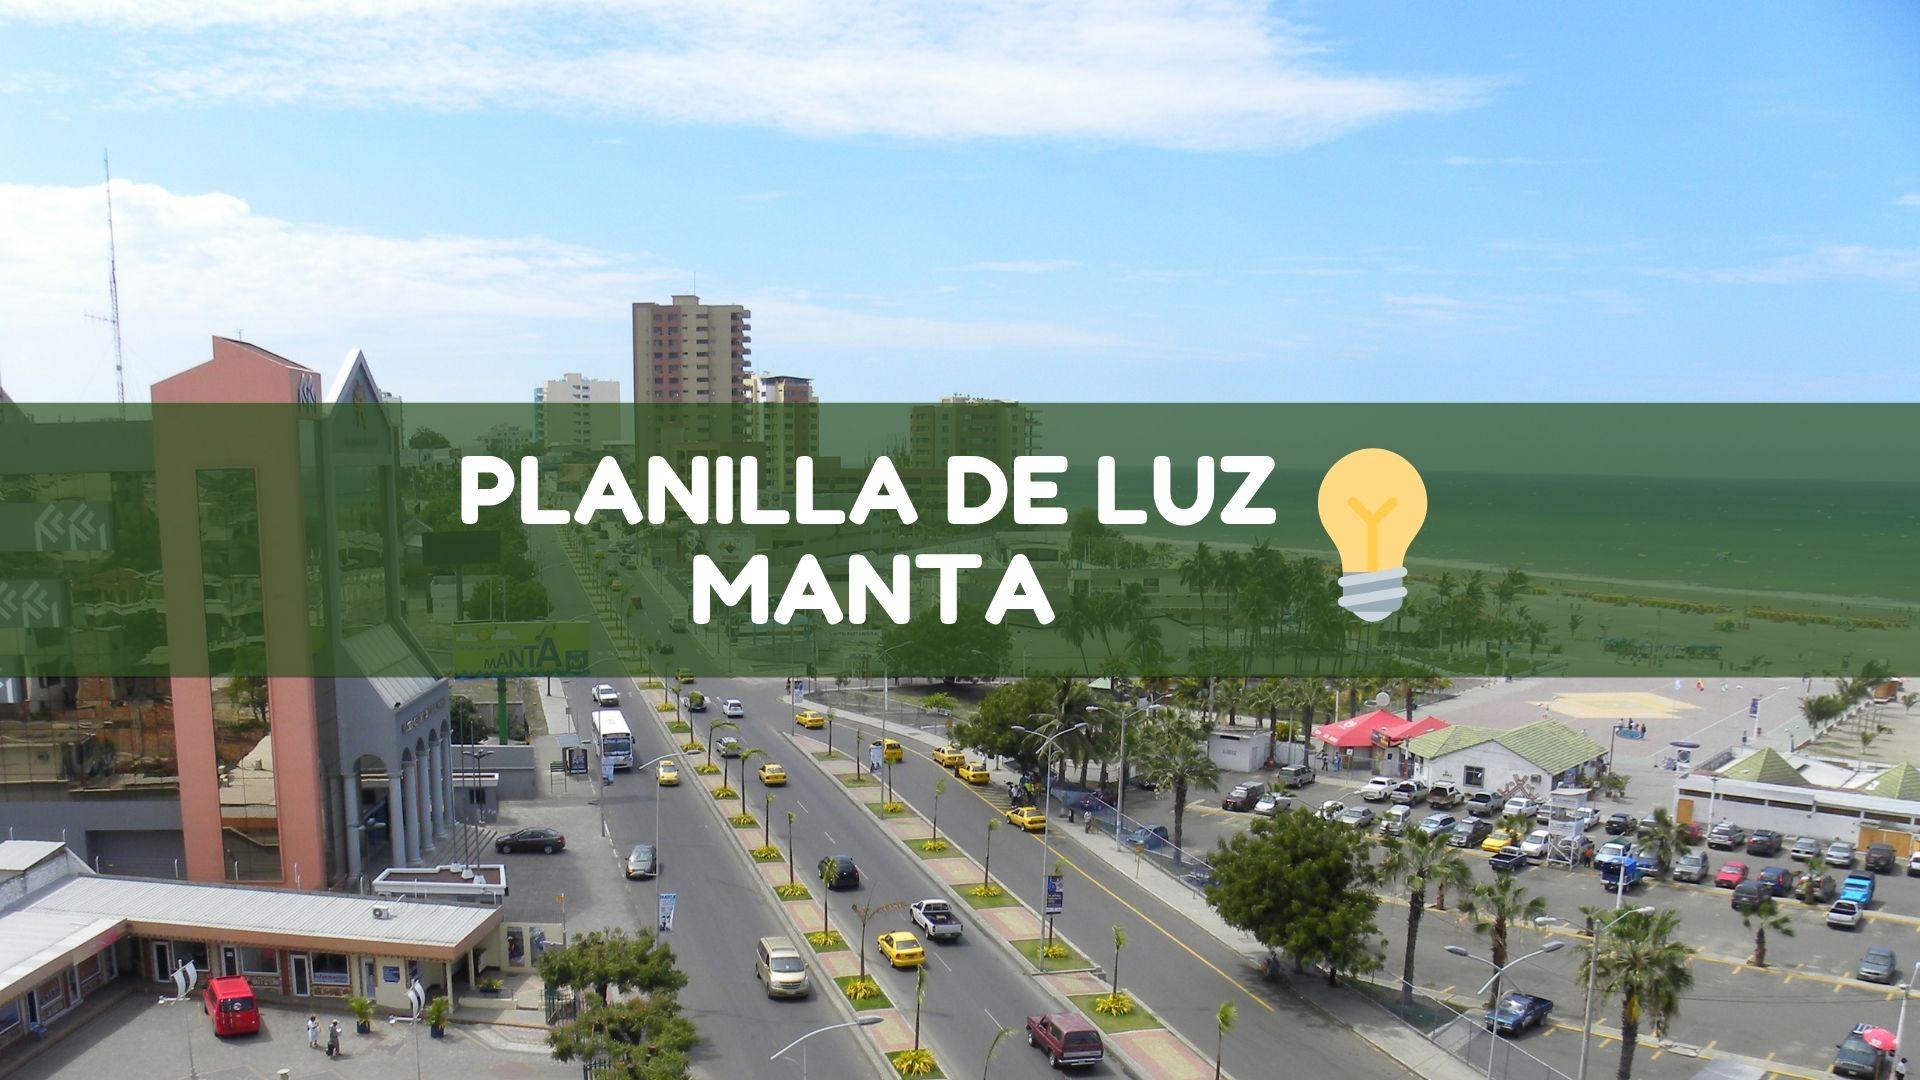 Planilla de luz Manta Ecuador